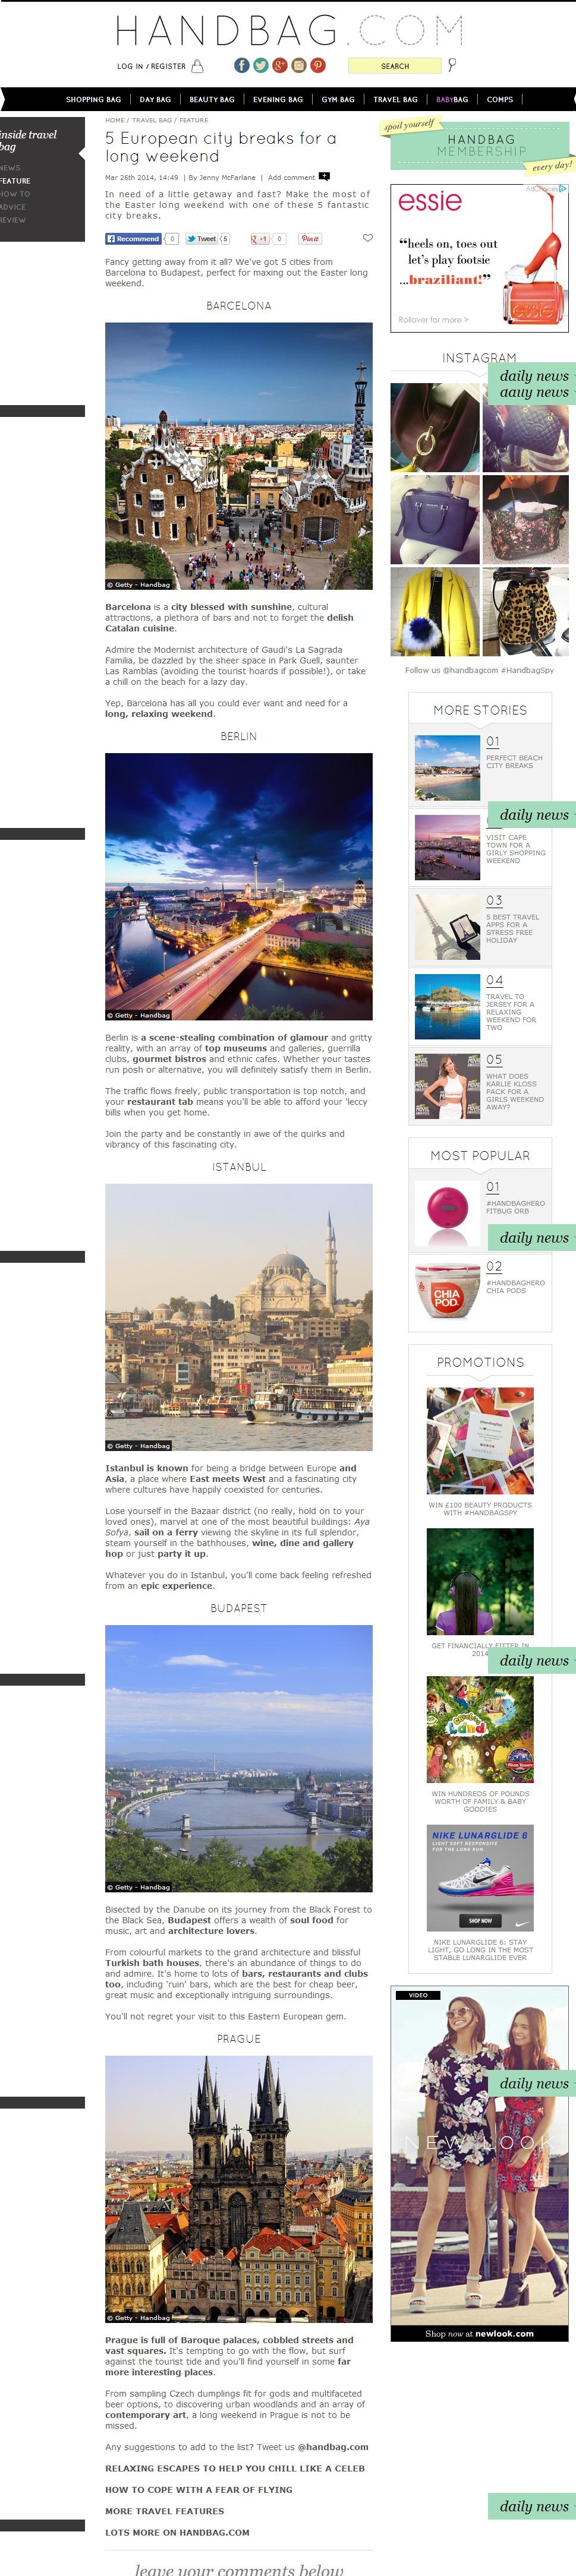 screencapture-www-handbag-com-travel-bag-feature-a559847-5-european-city-breaks-for-a-long-weekend-html